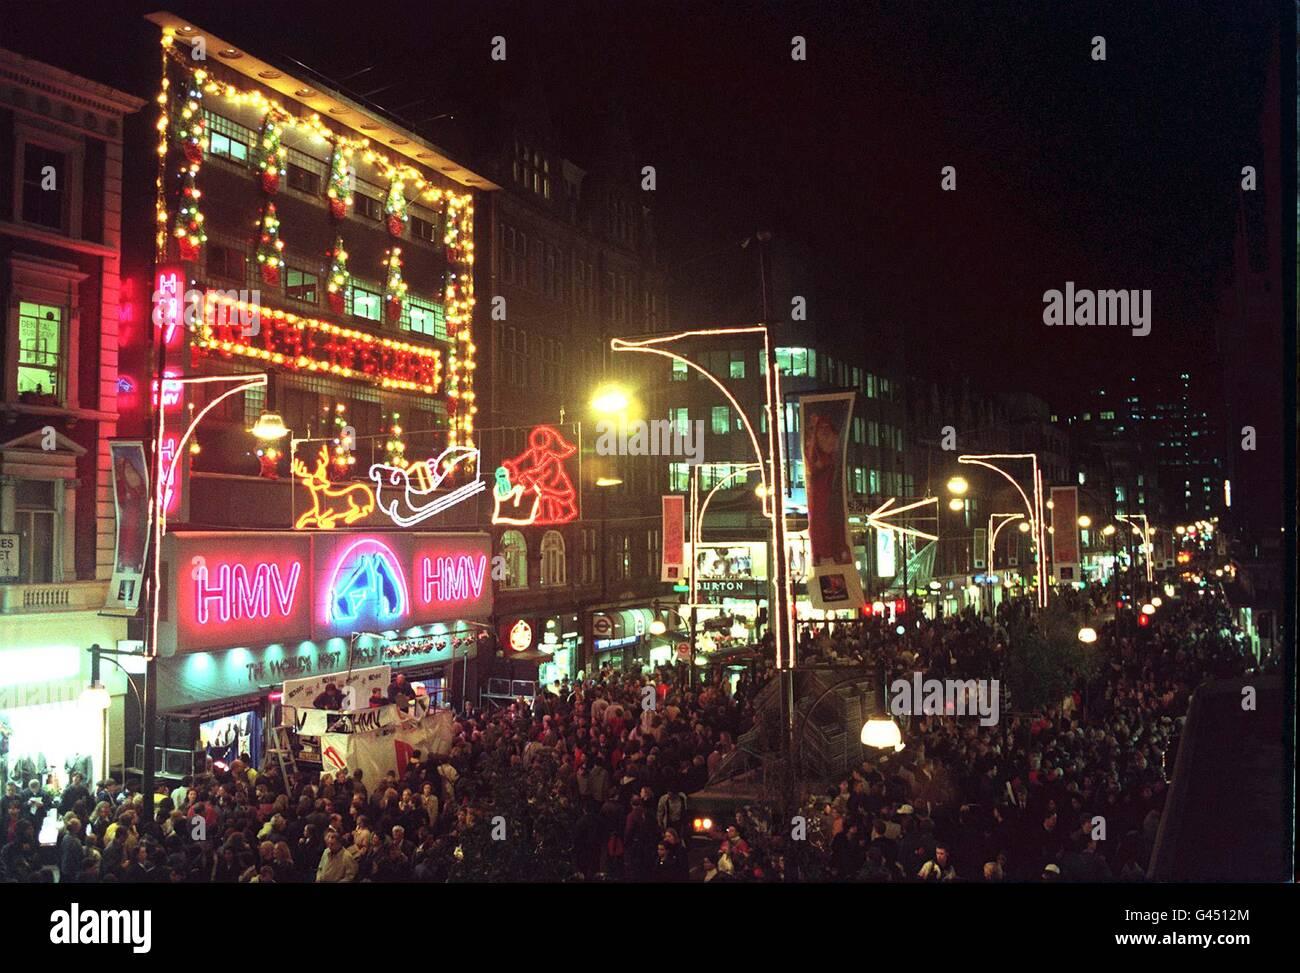 SHOWBIZ Oxford Street lights - Stock Image